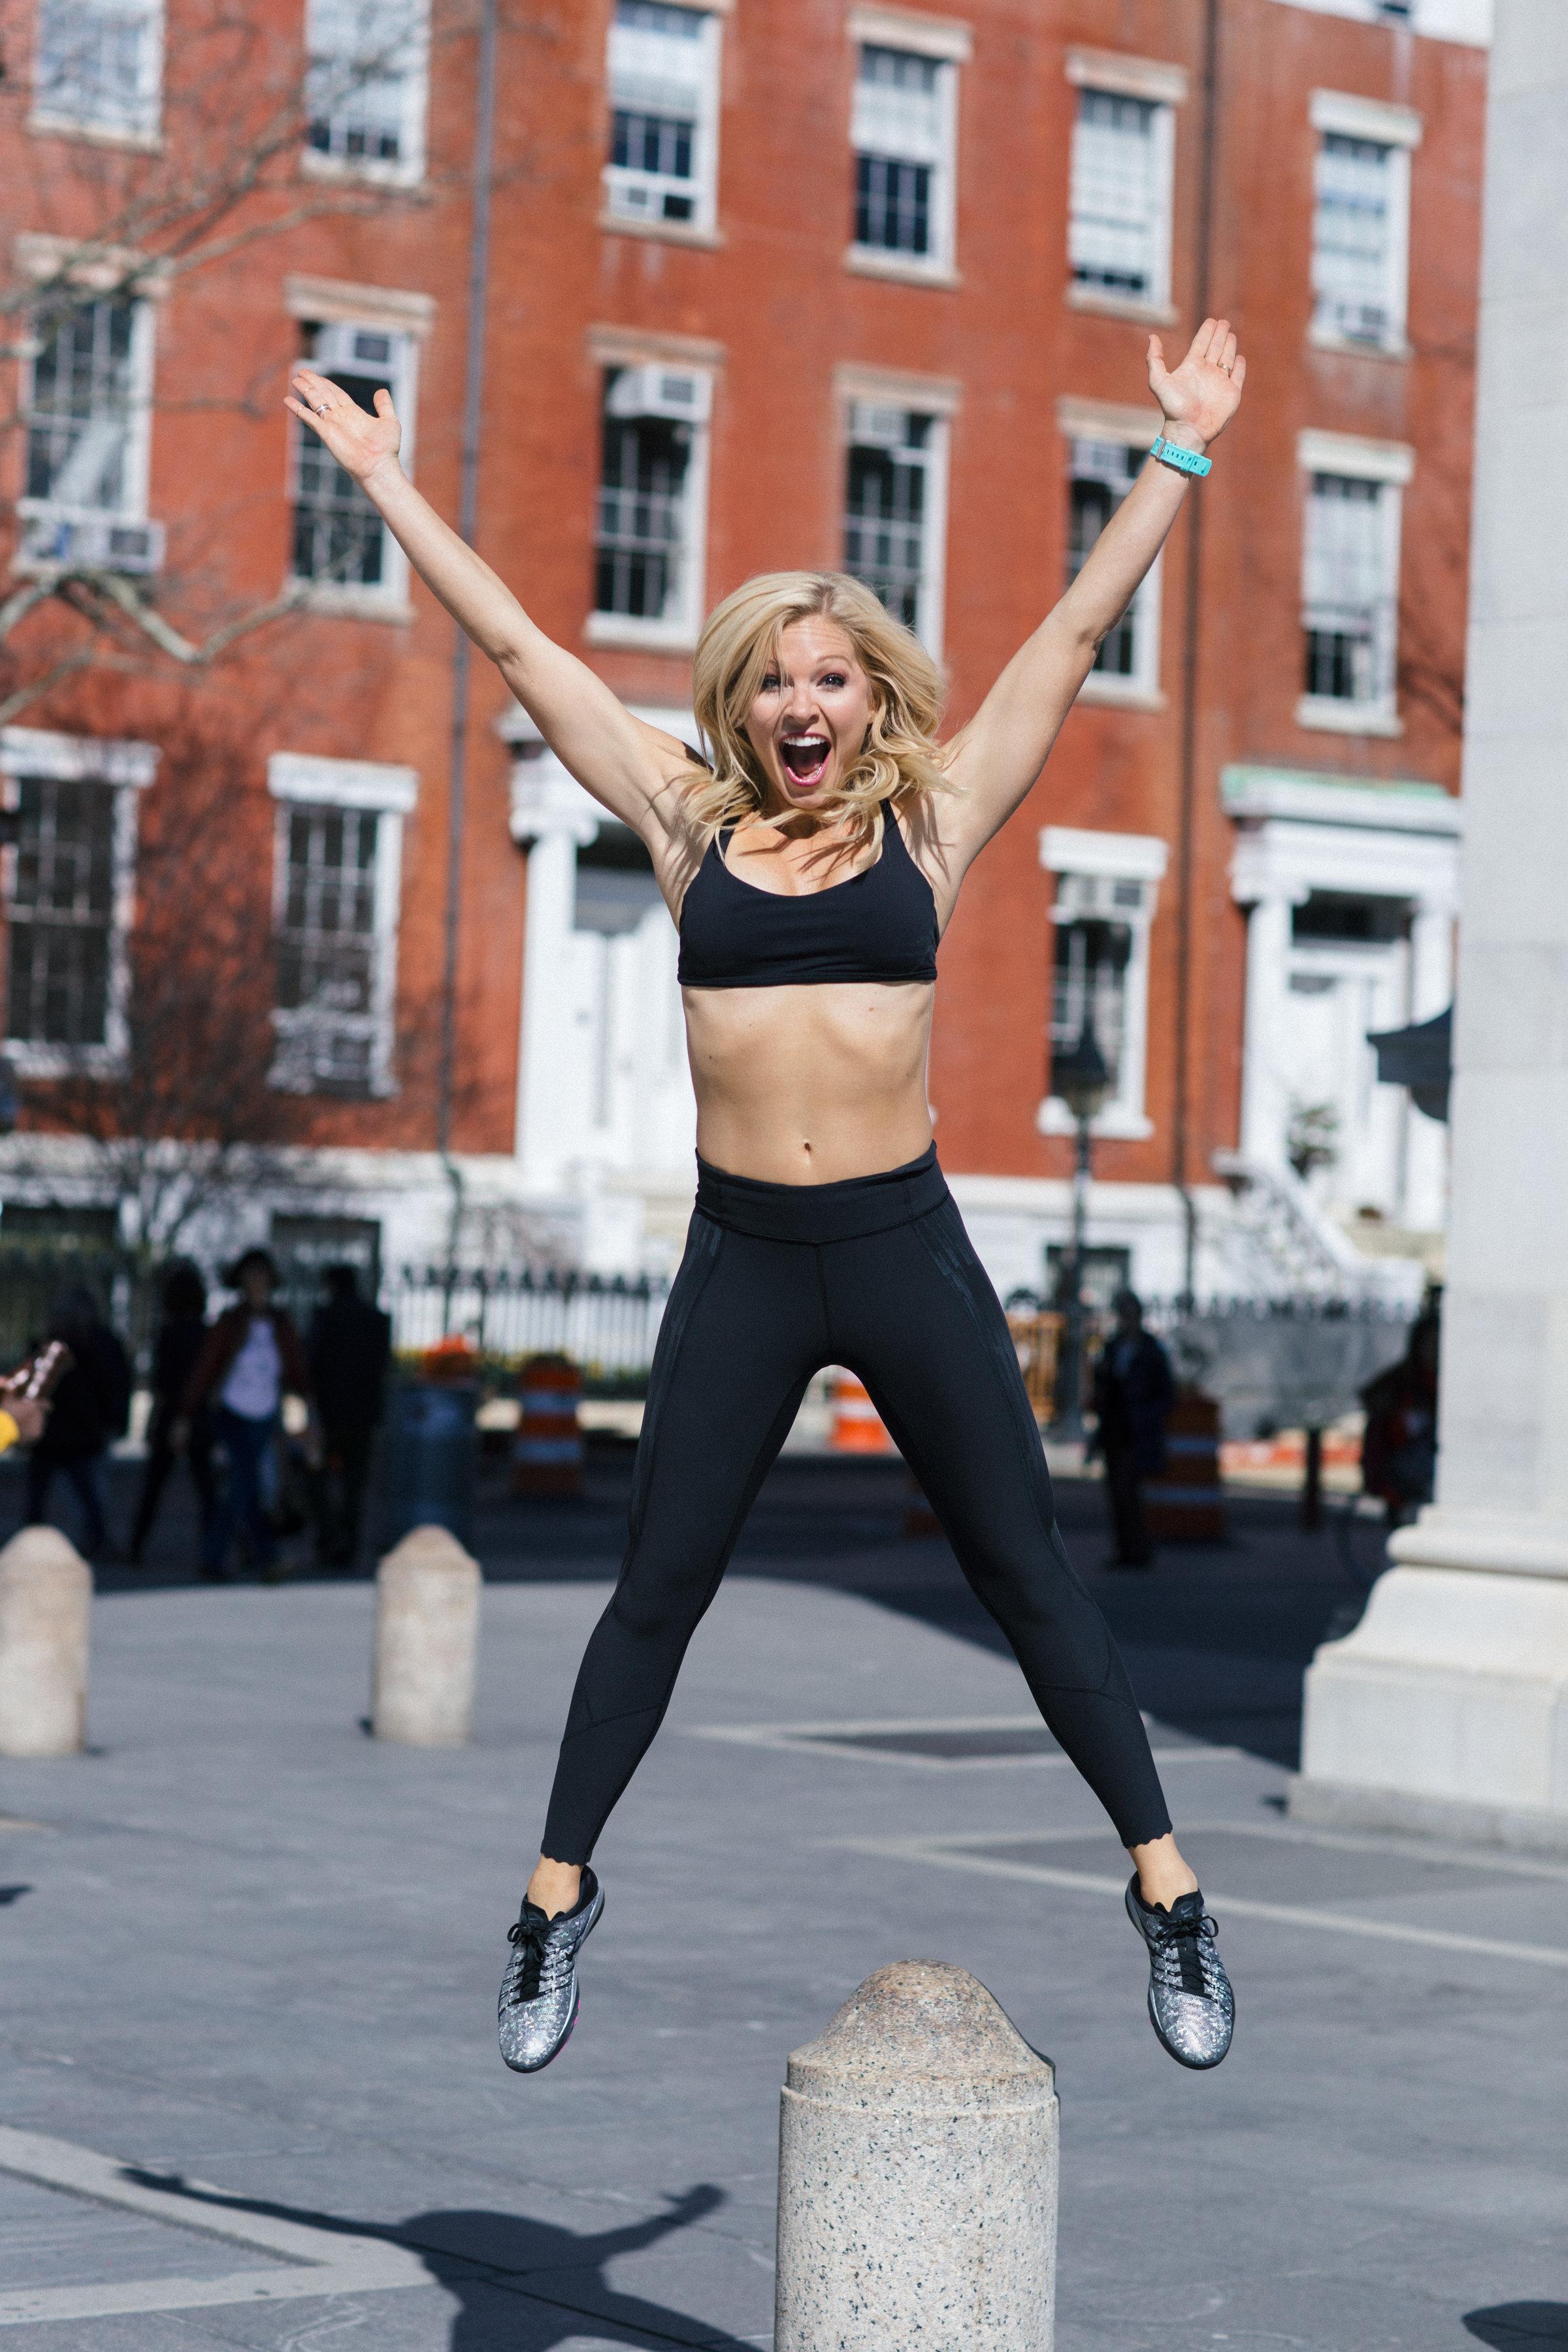 Anna Kooiman new york city fitness travel lifestyle adventure fun television entertainment annakooiman.com